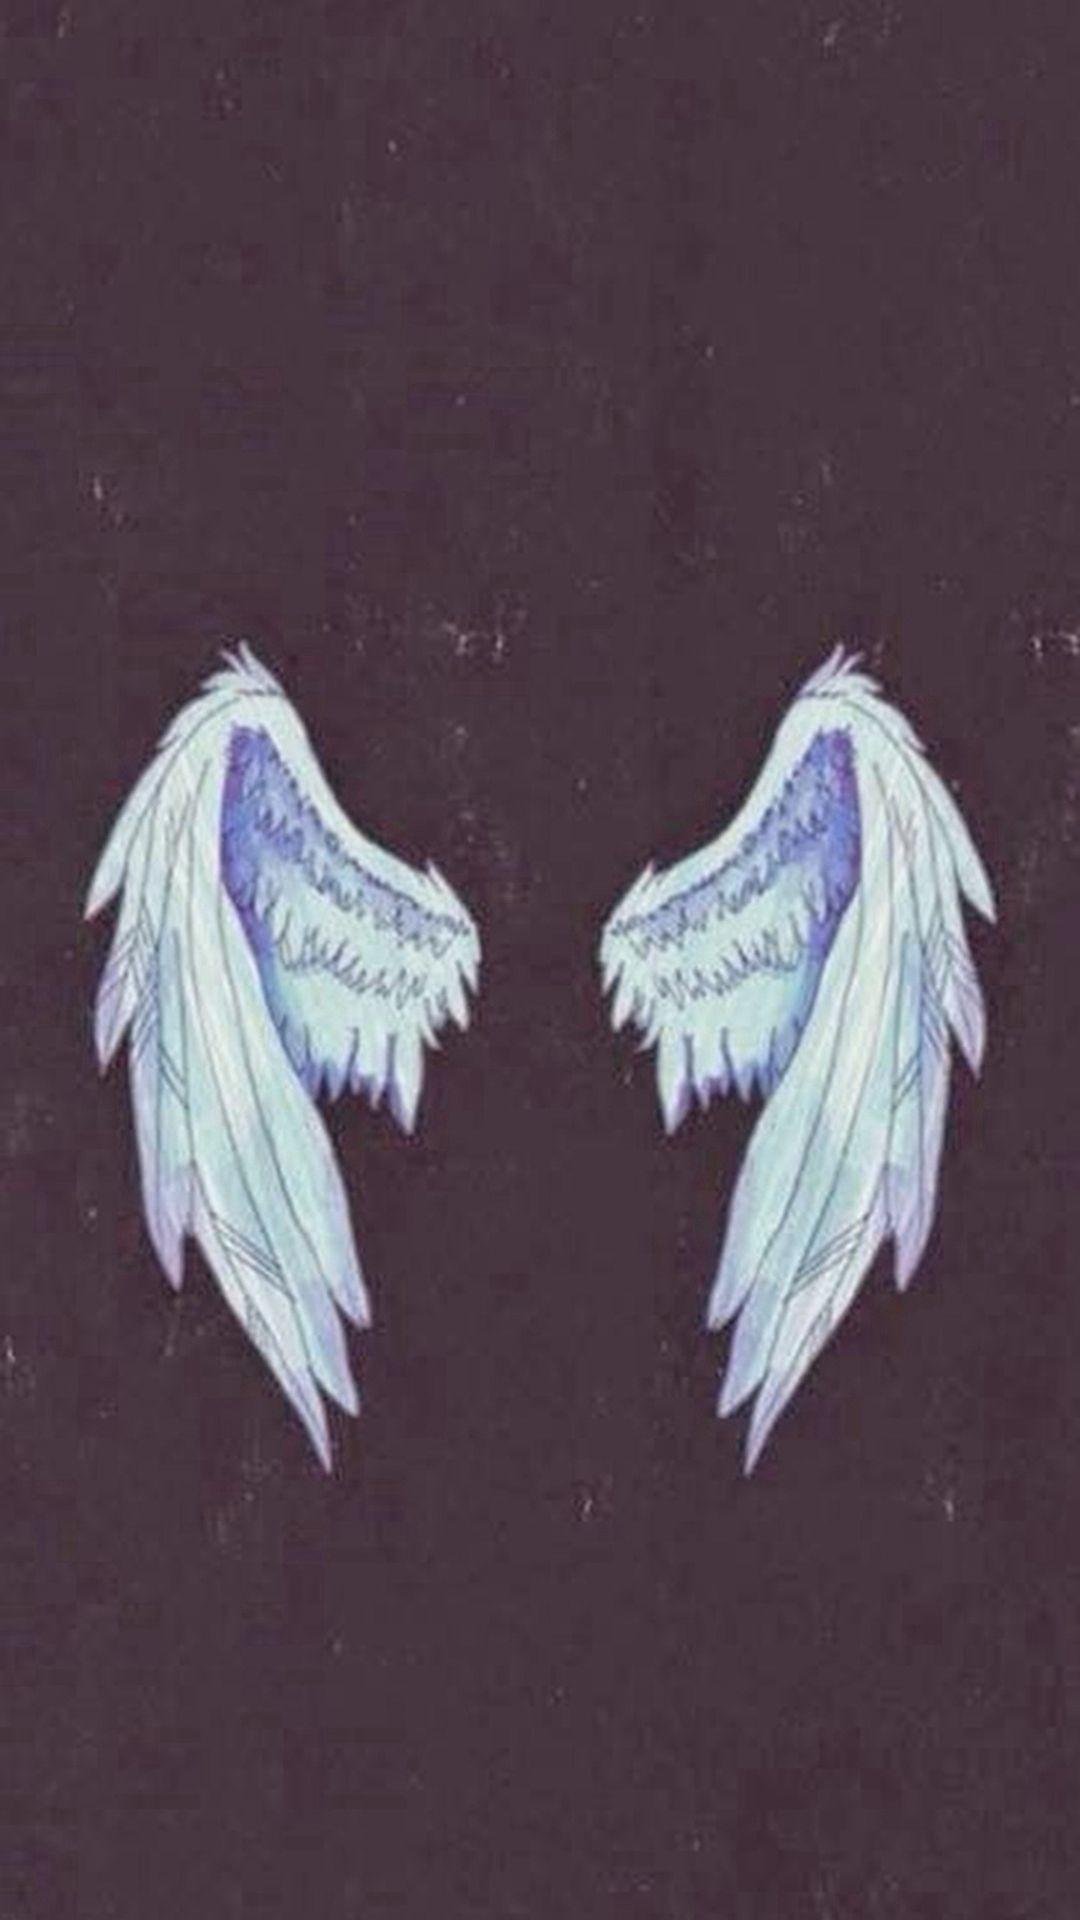 67 Angel Wings Wallpapers on WallpaperPlay 1080x1920